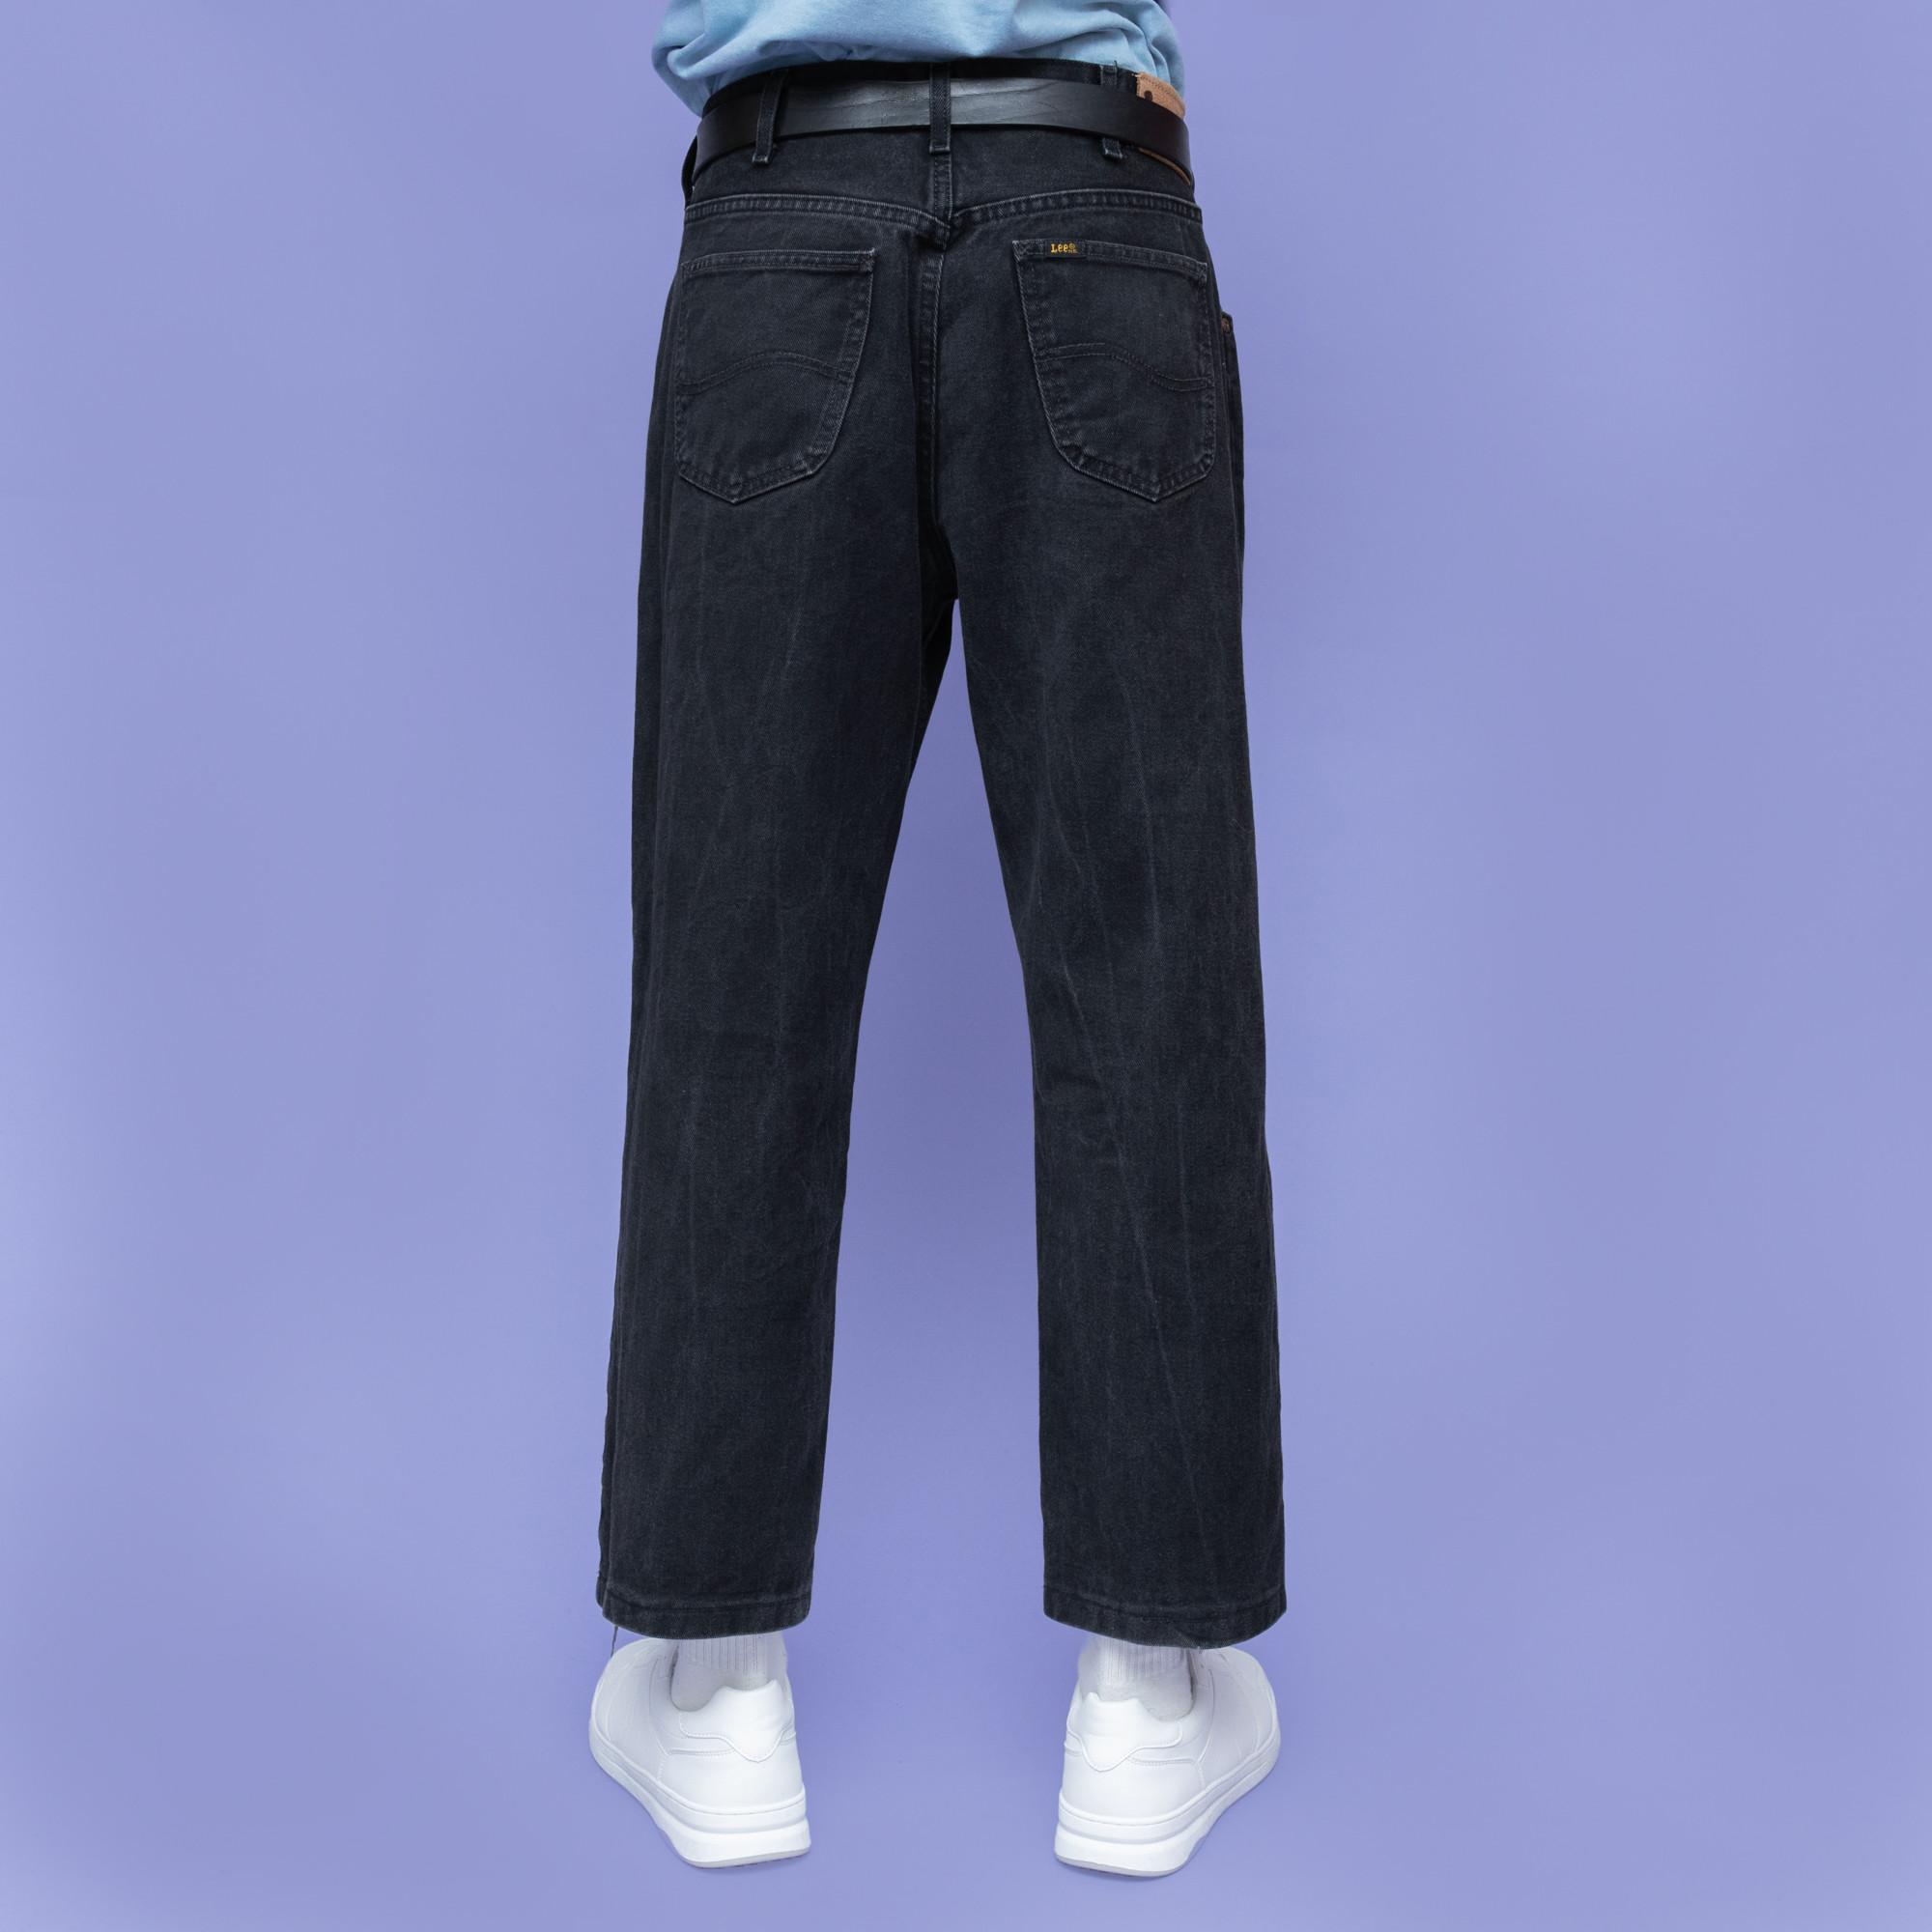 Czarne jeansy marki Lee - KEX Vintage Store | JestemSlow.pl